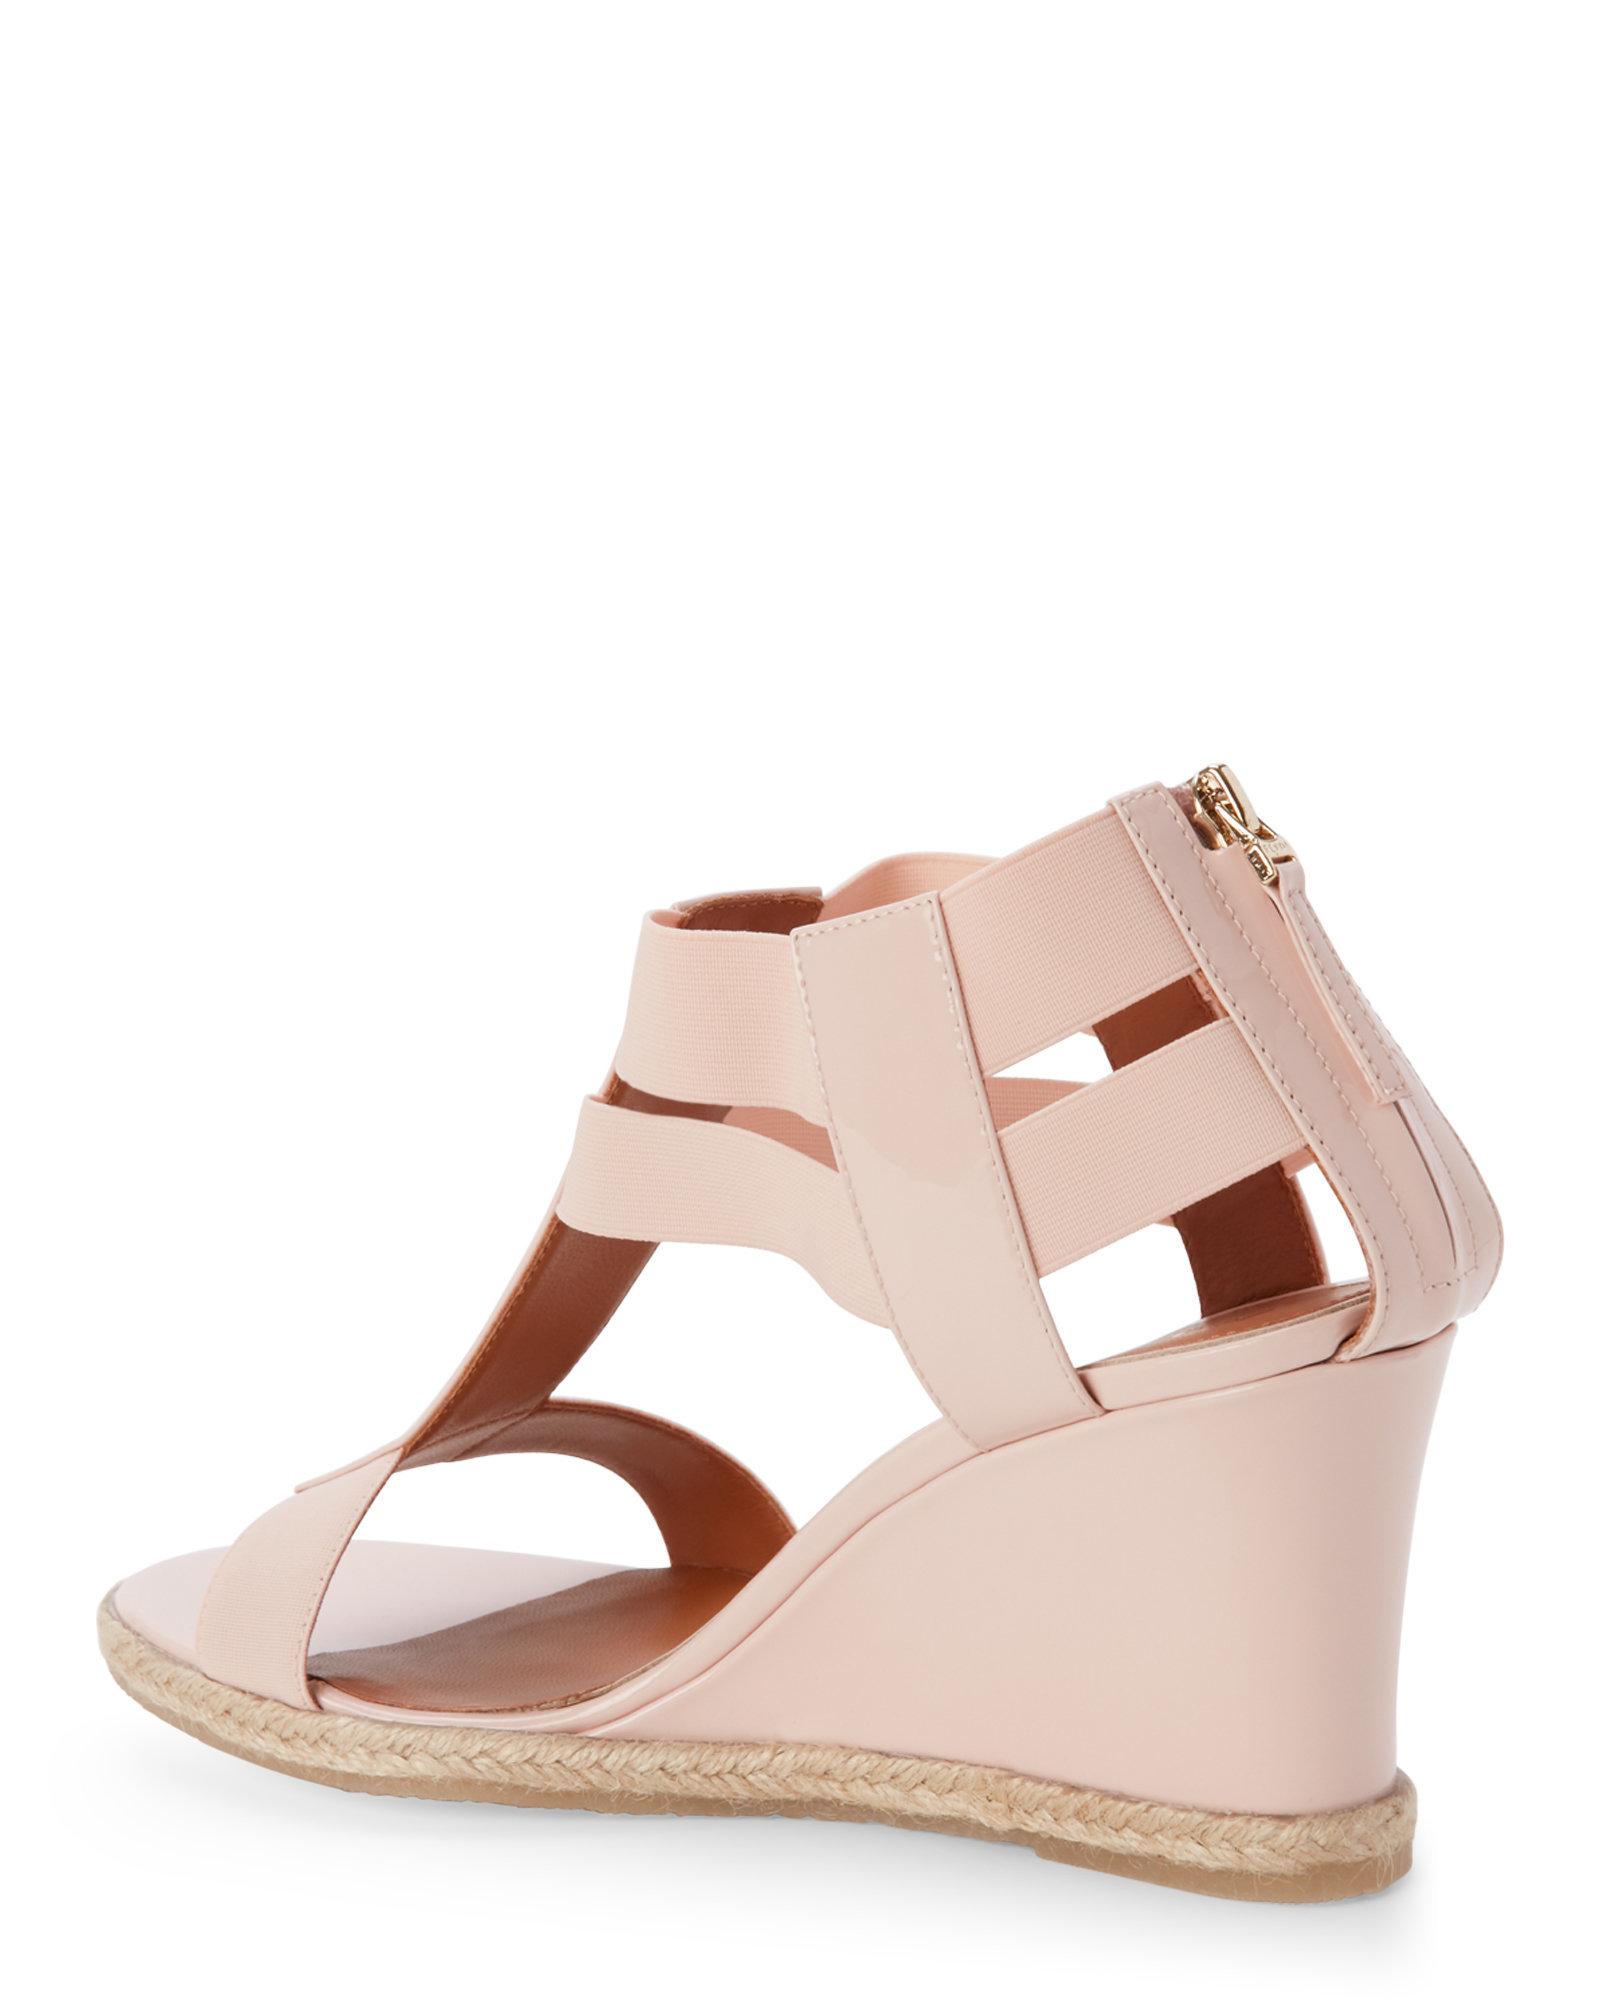 fendi pink carioca wedge sandals in pink lyst